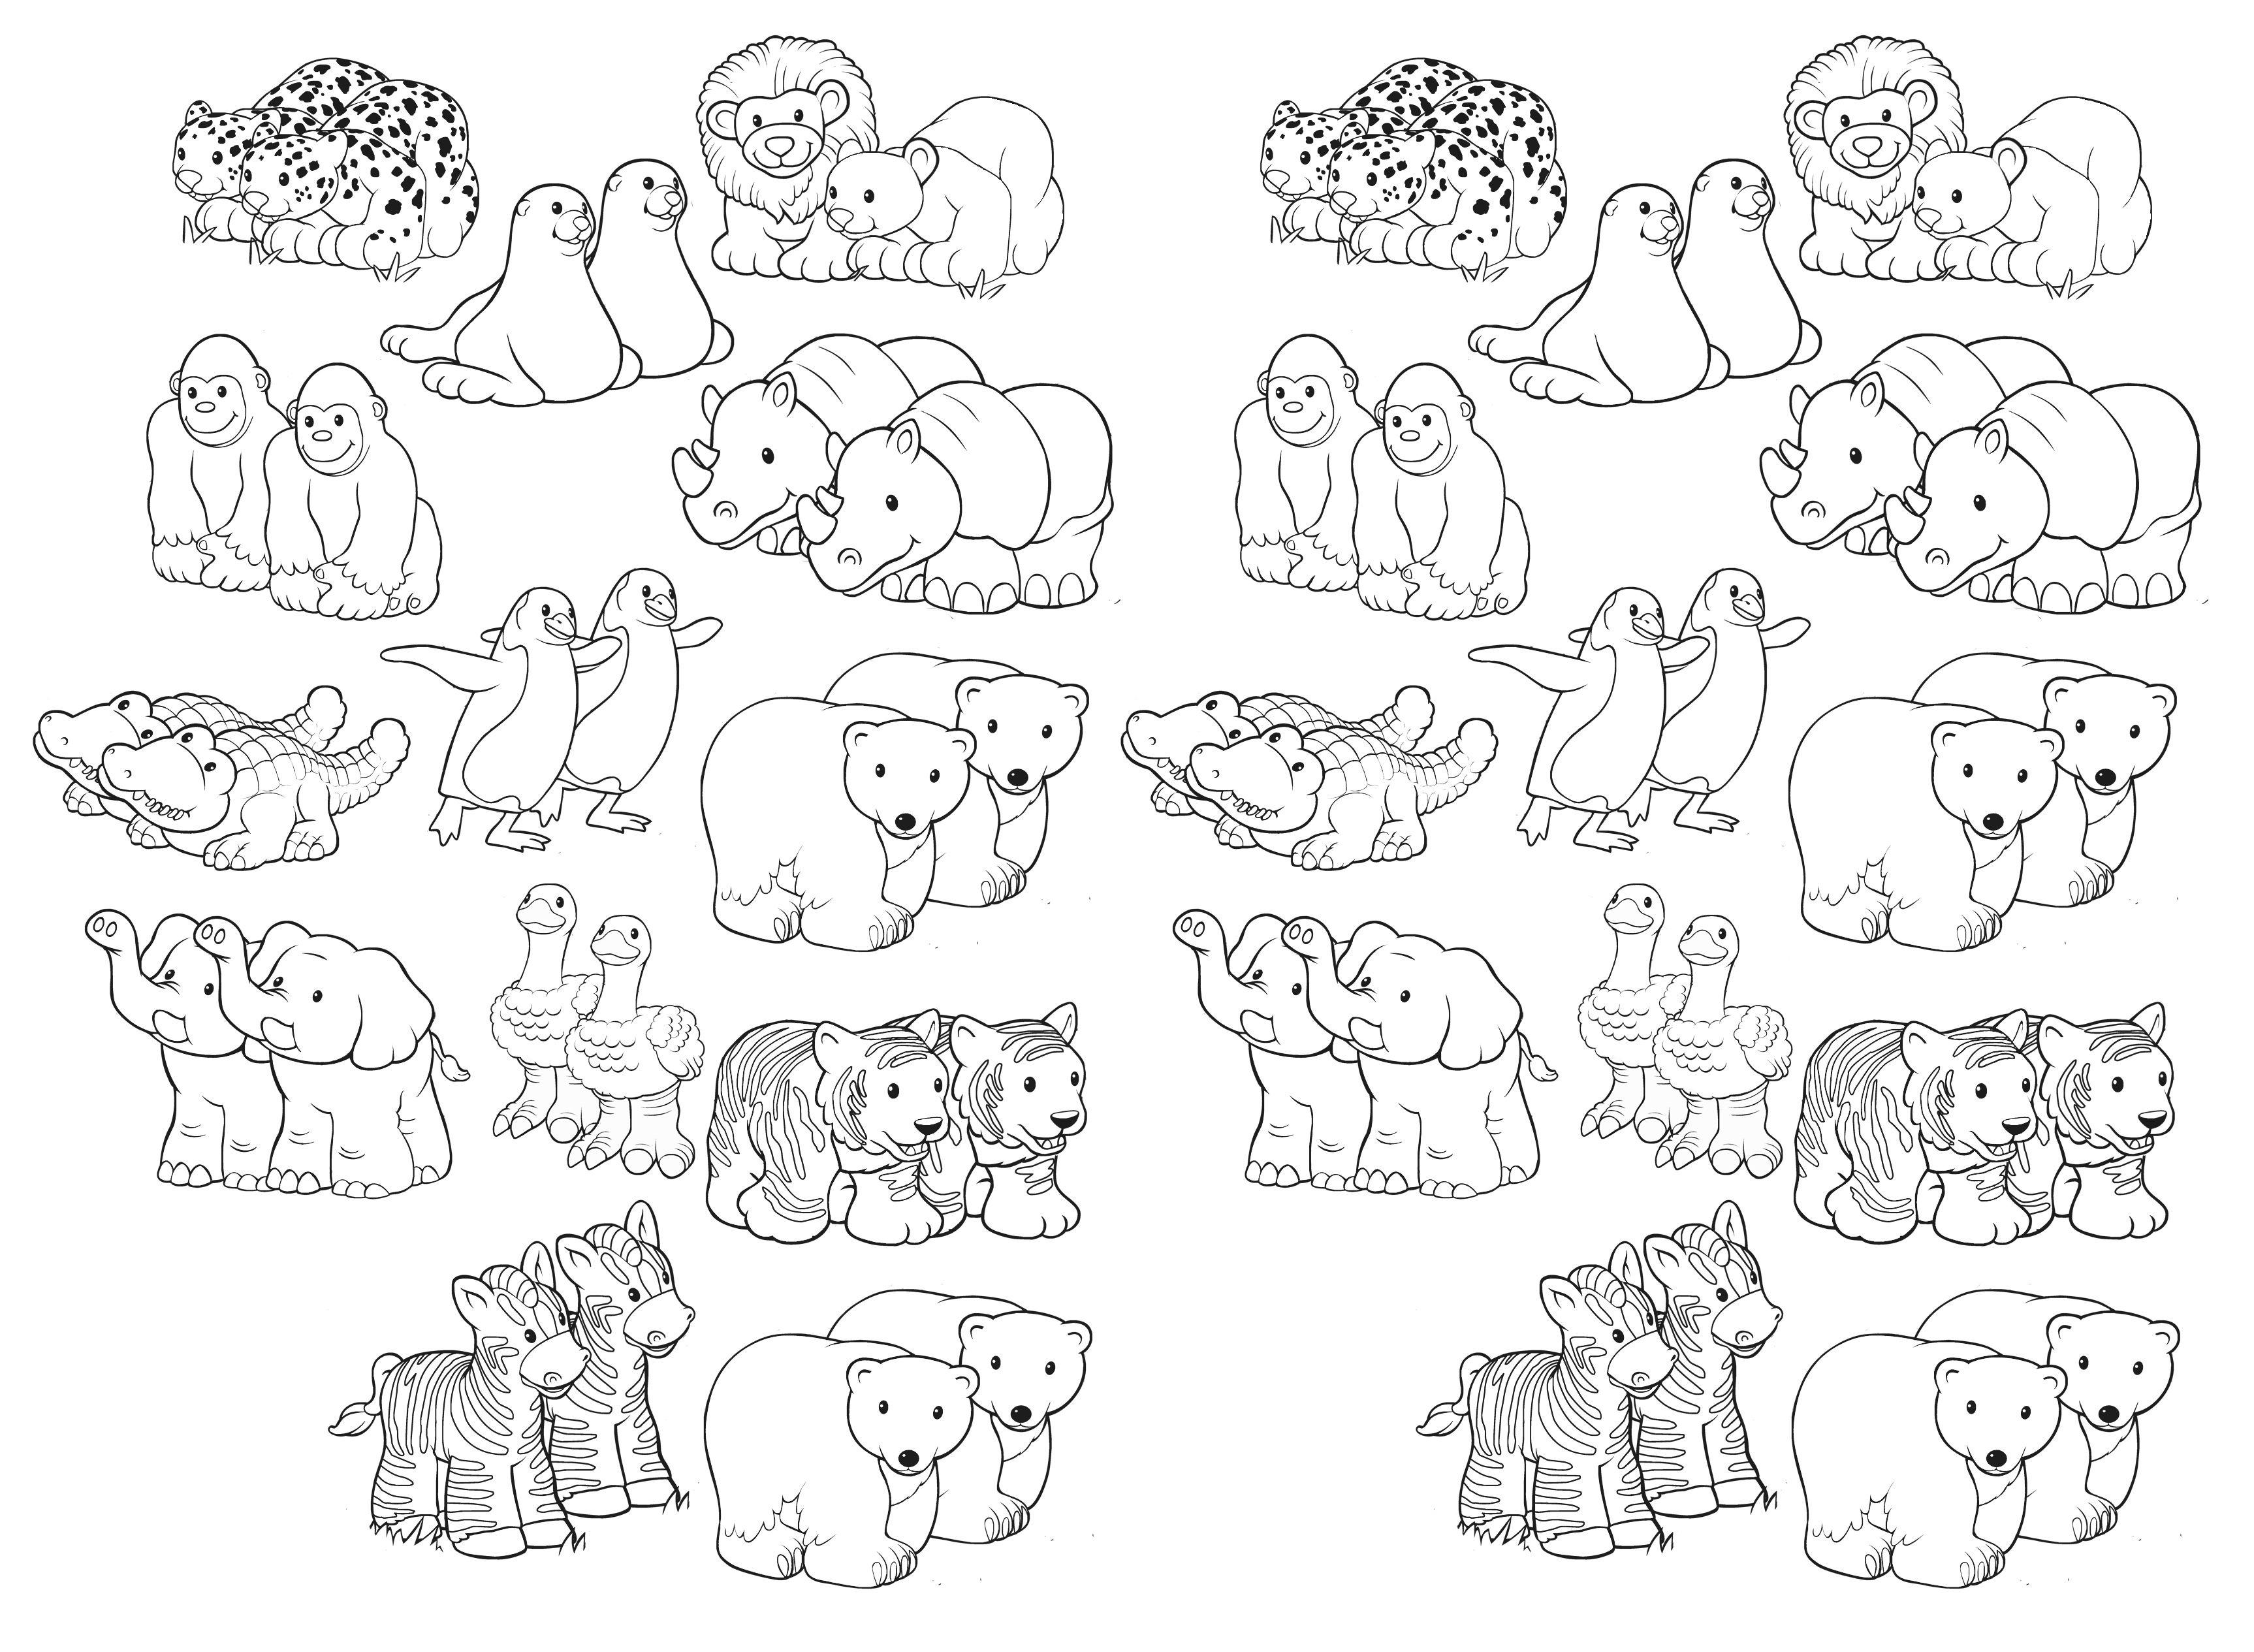 Noah's Ark Free Printable Of Animal Pairs | Godsdienstonderwijs - Free Noah's Ark Printables